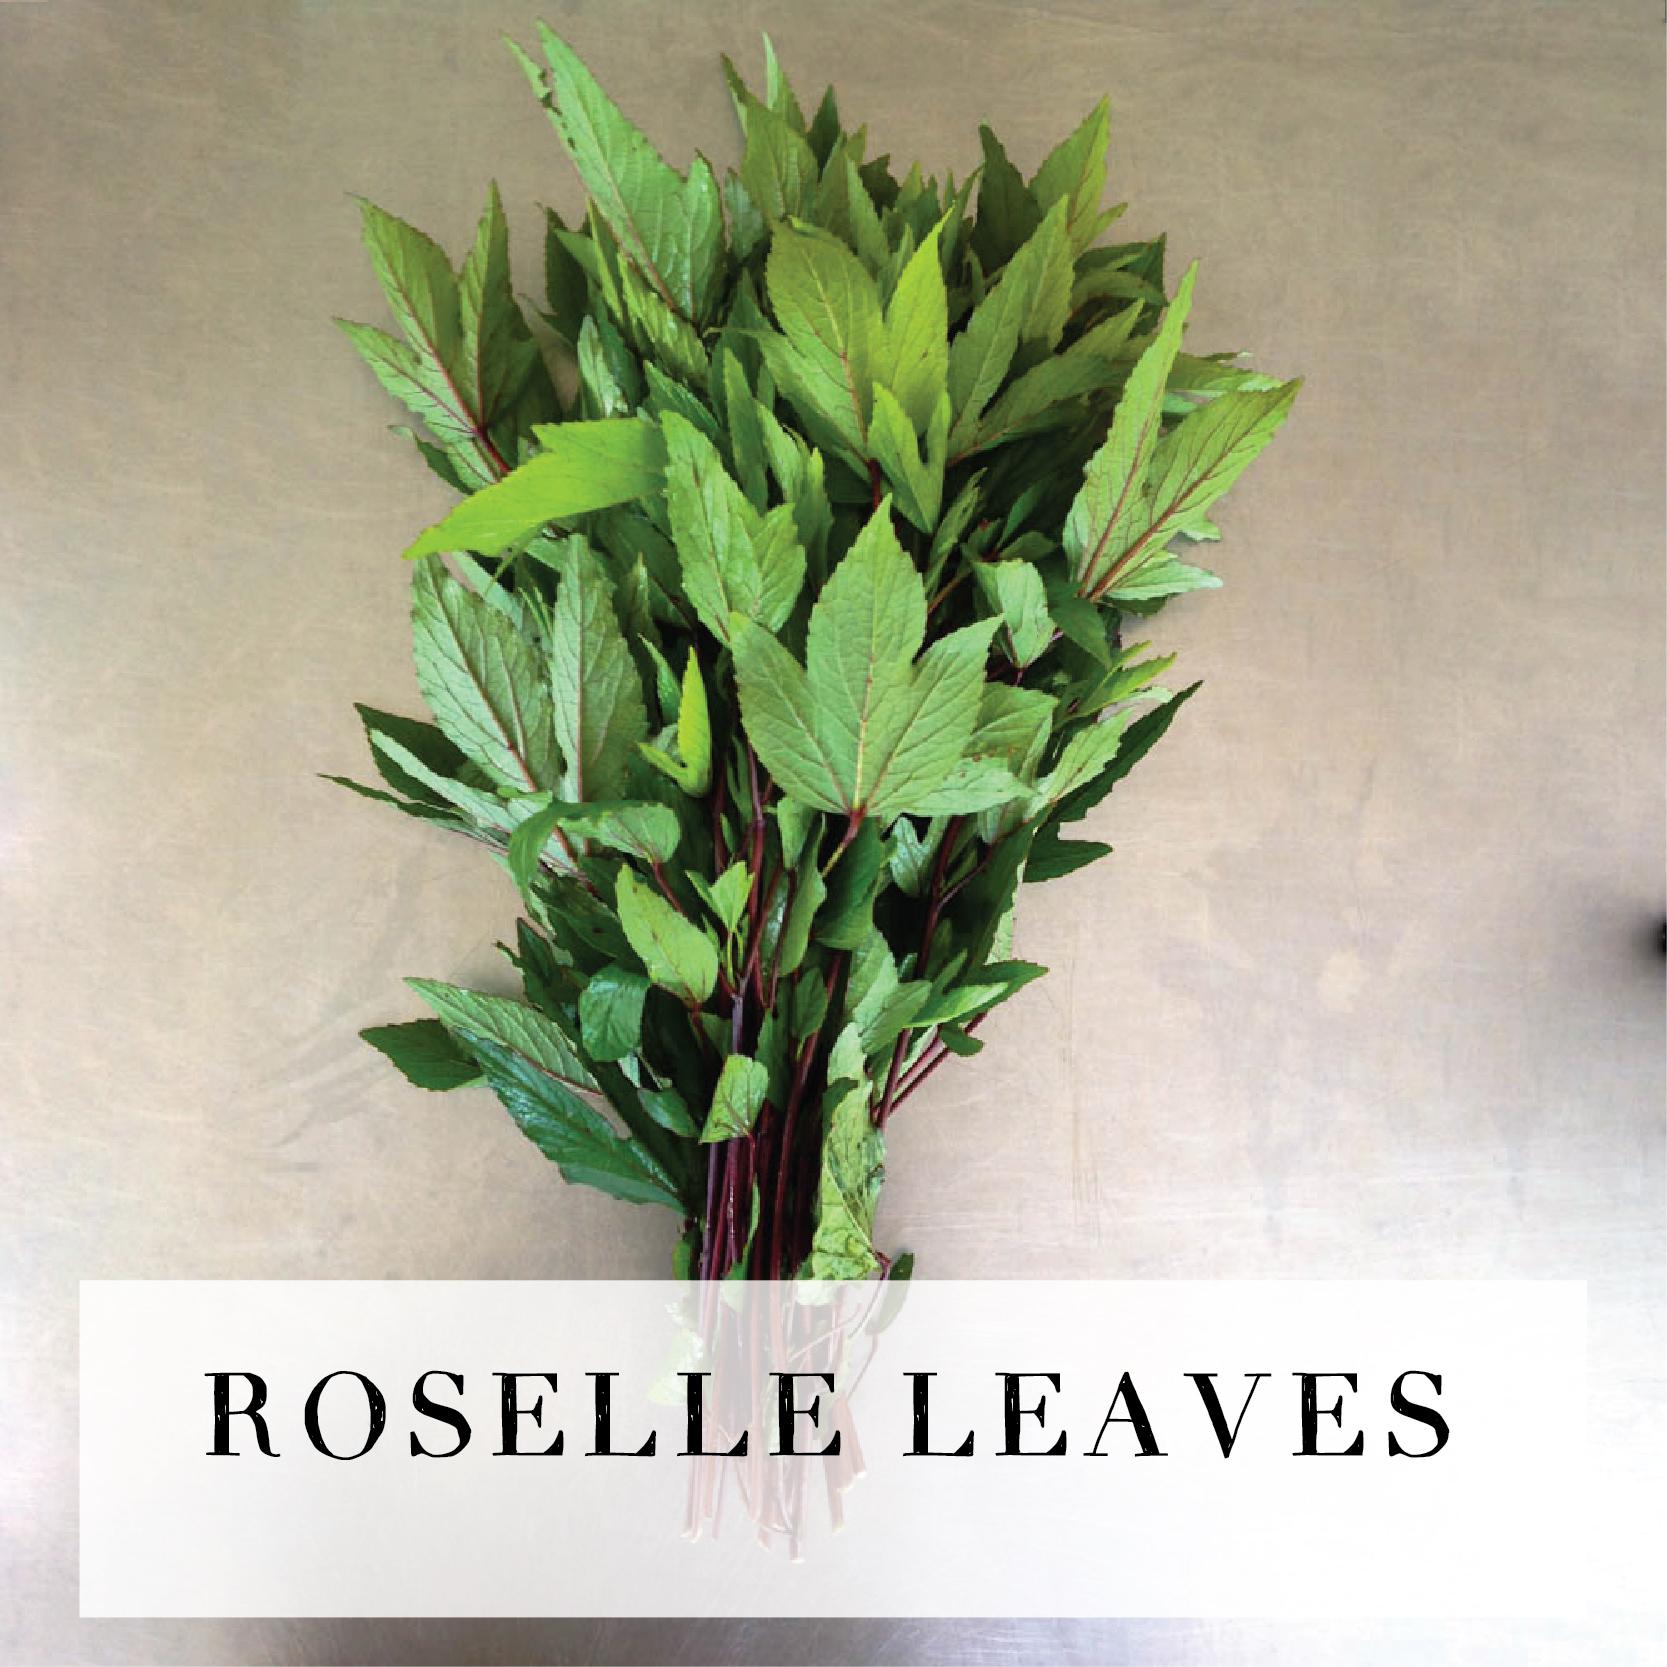 roselleleaves.jpg